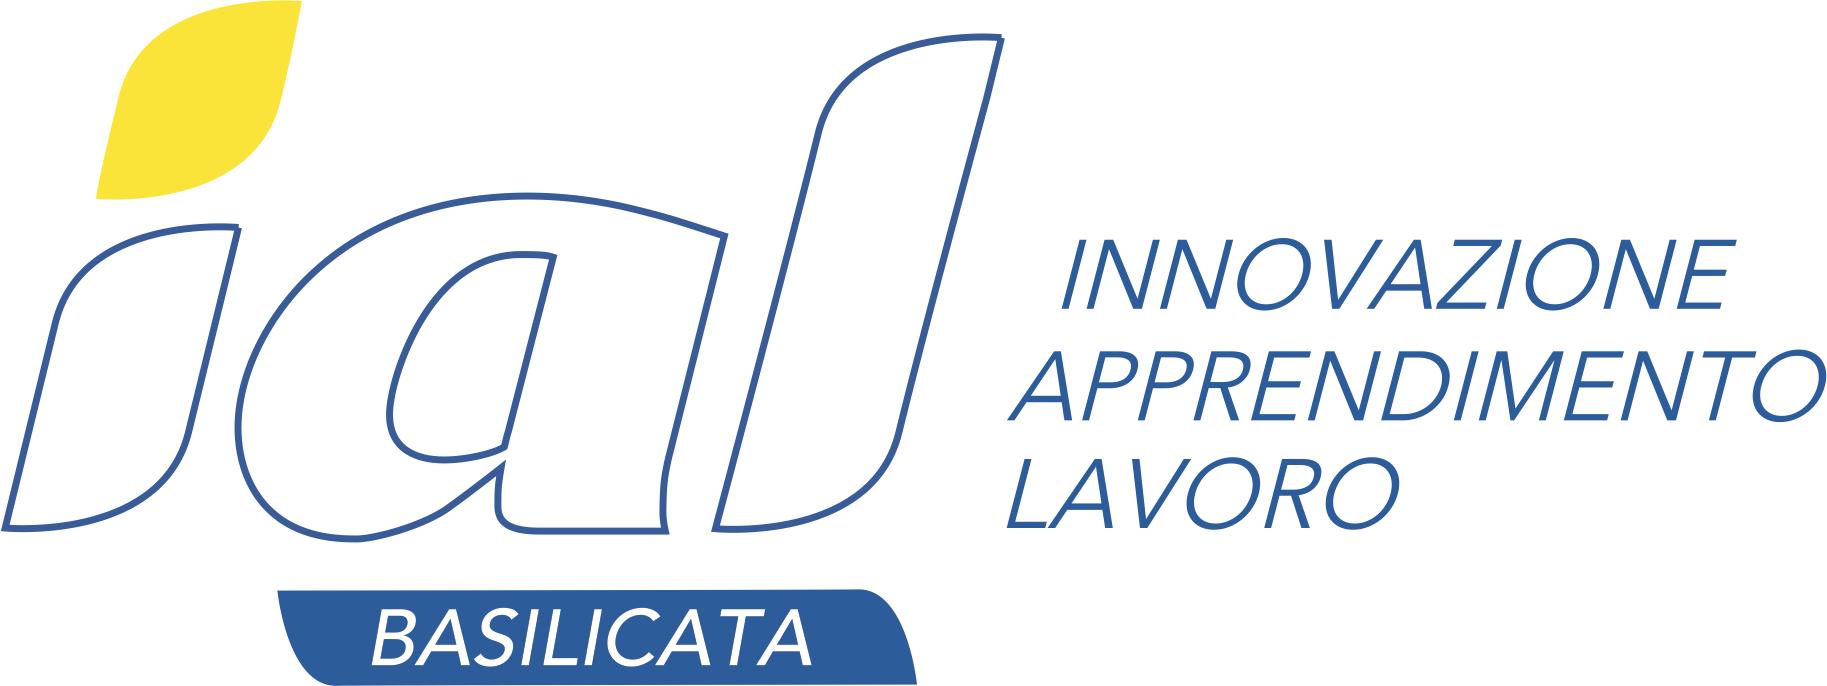 IAL Basilicata